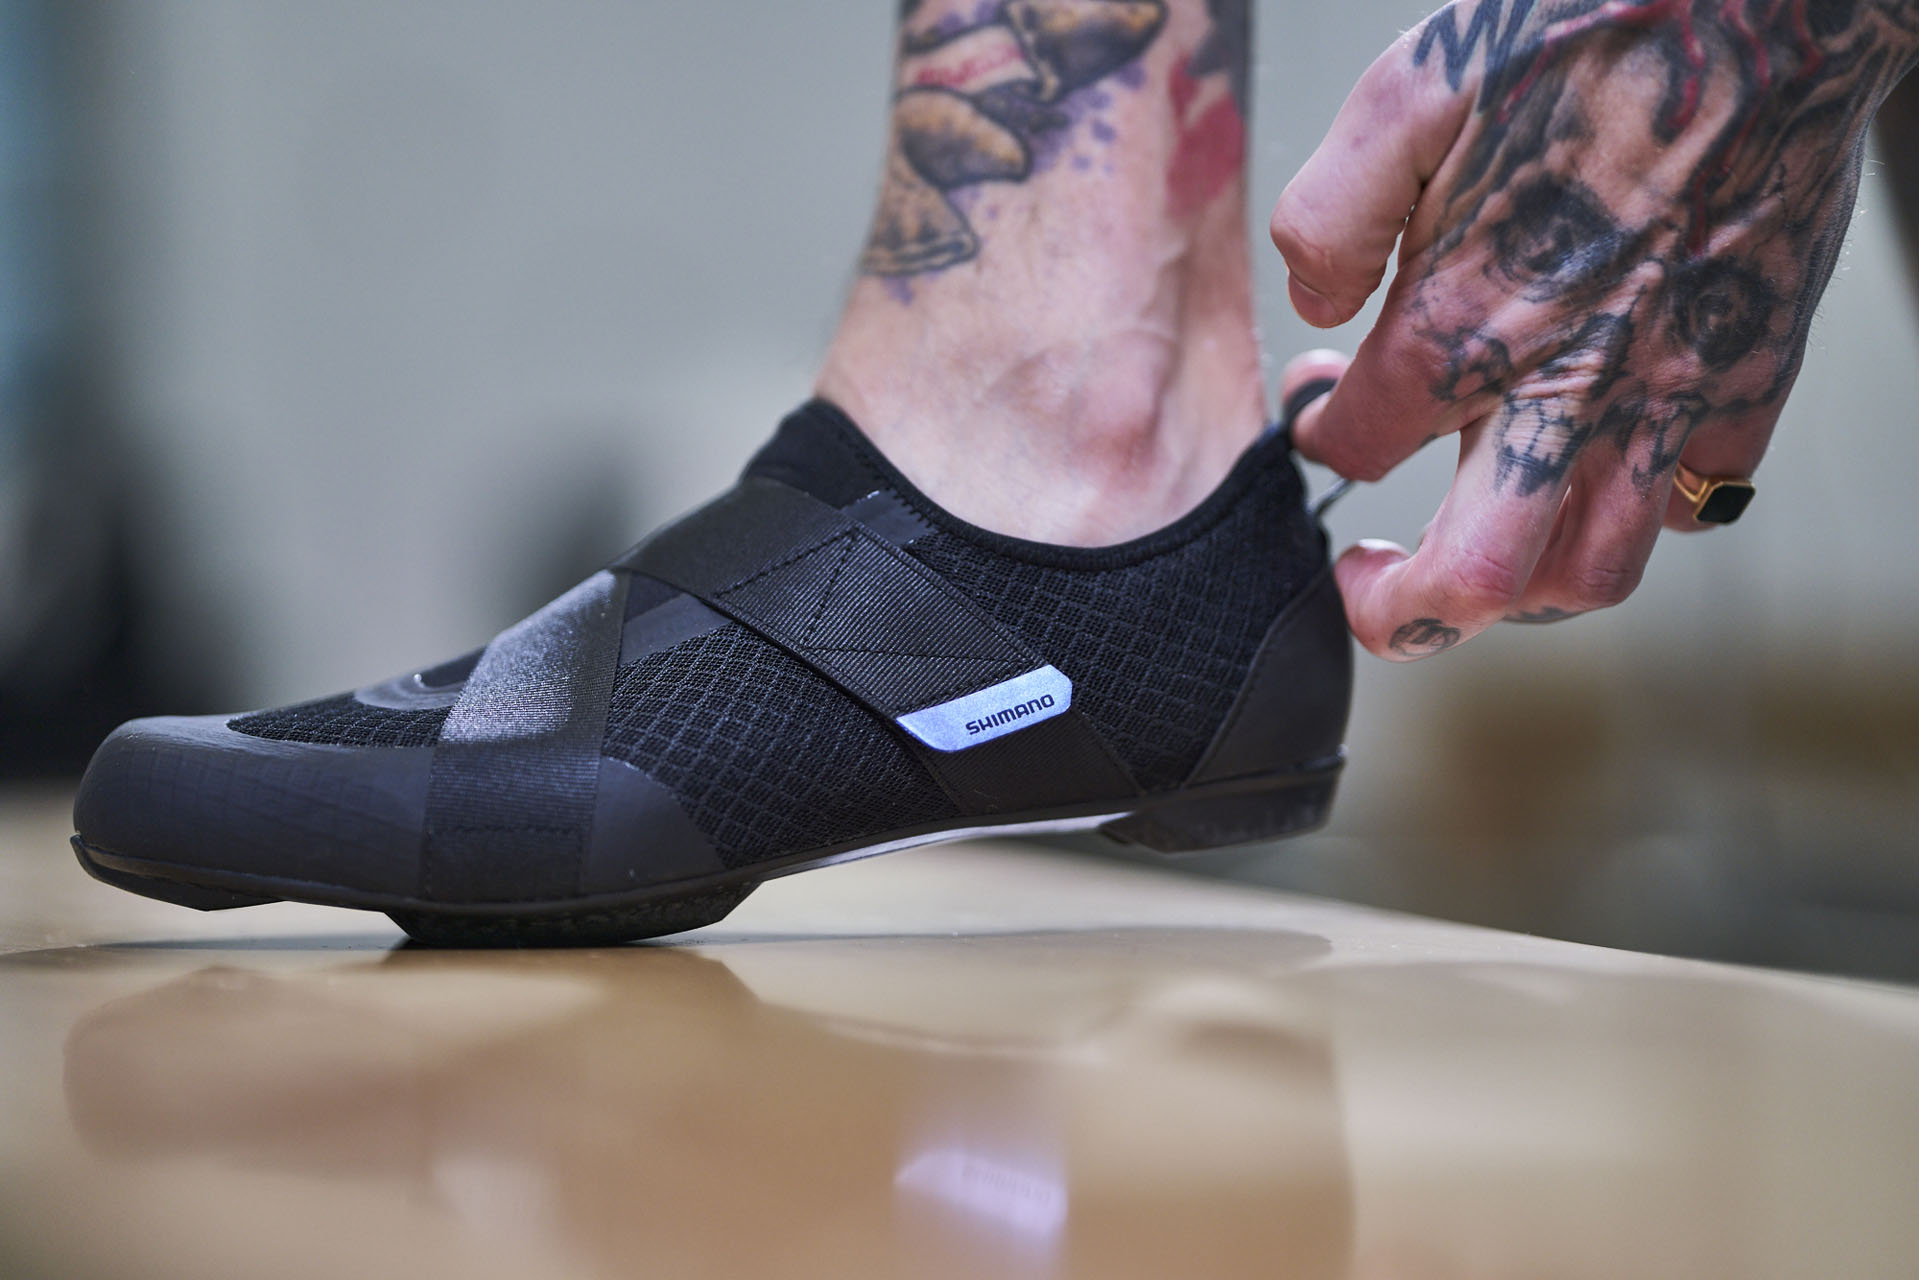 chaussures-velo-shimano-indorr-210406-0005.jpg